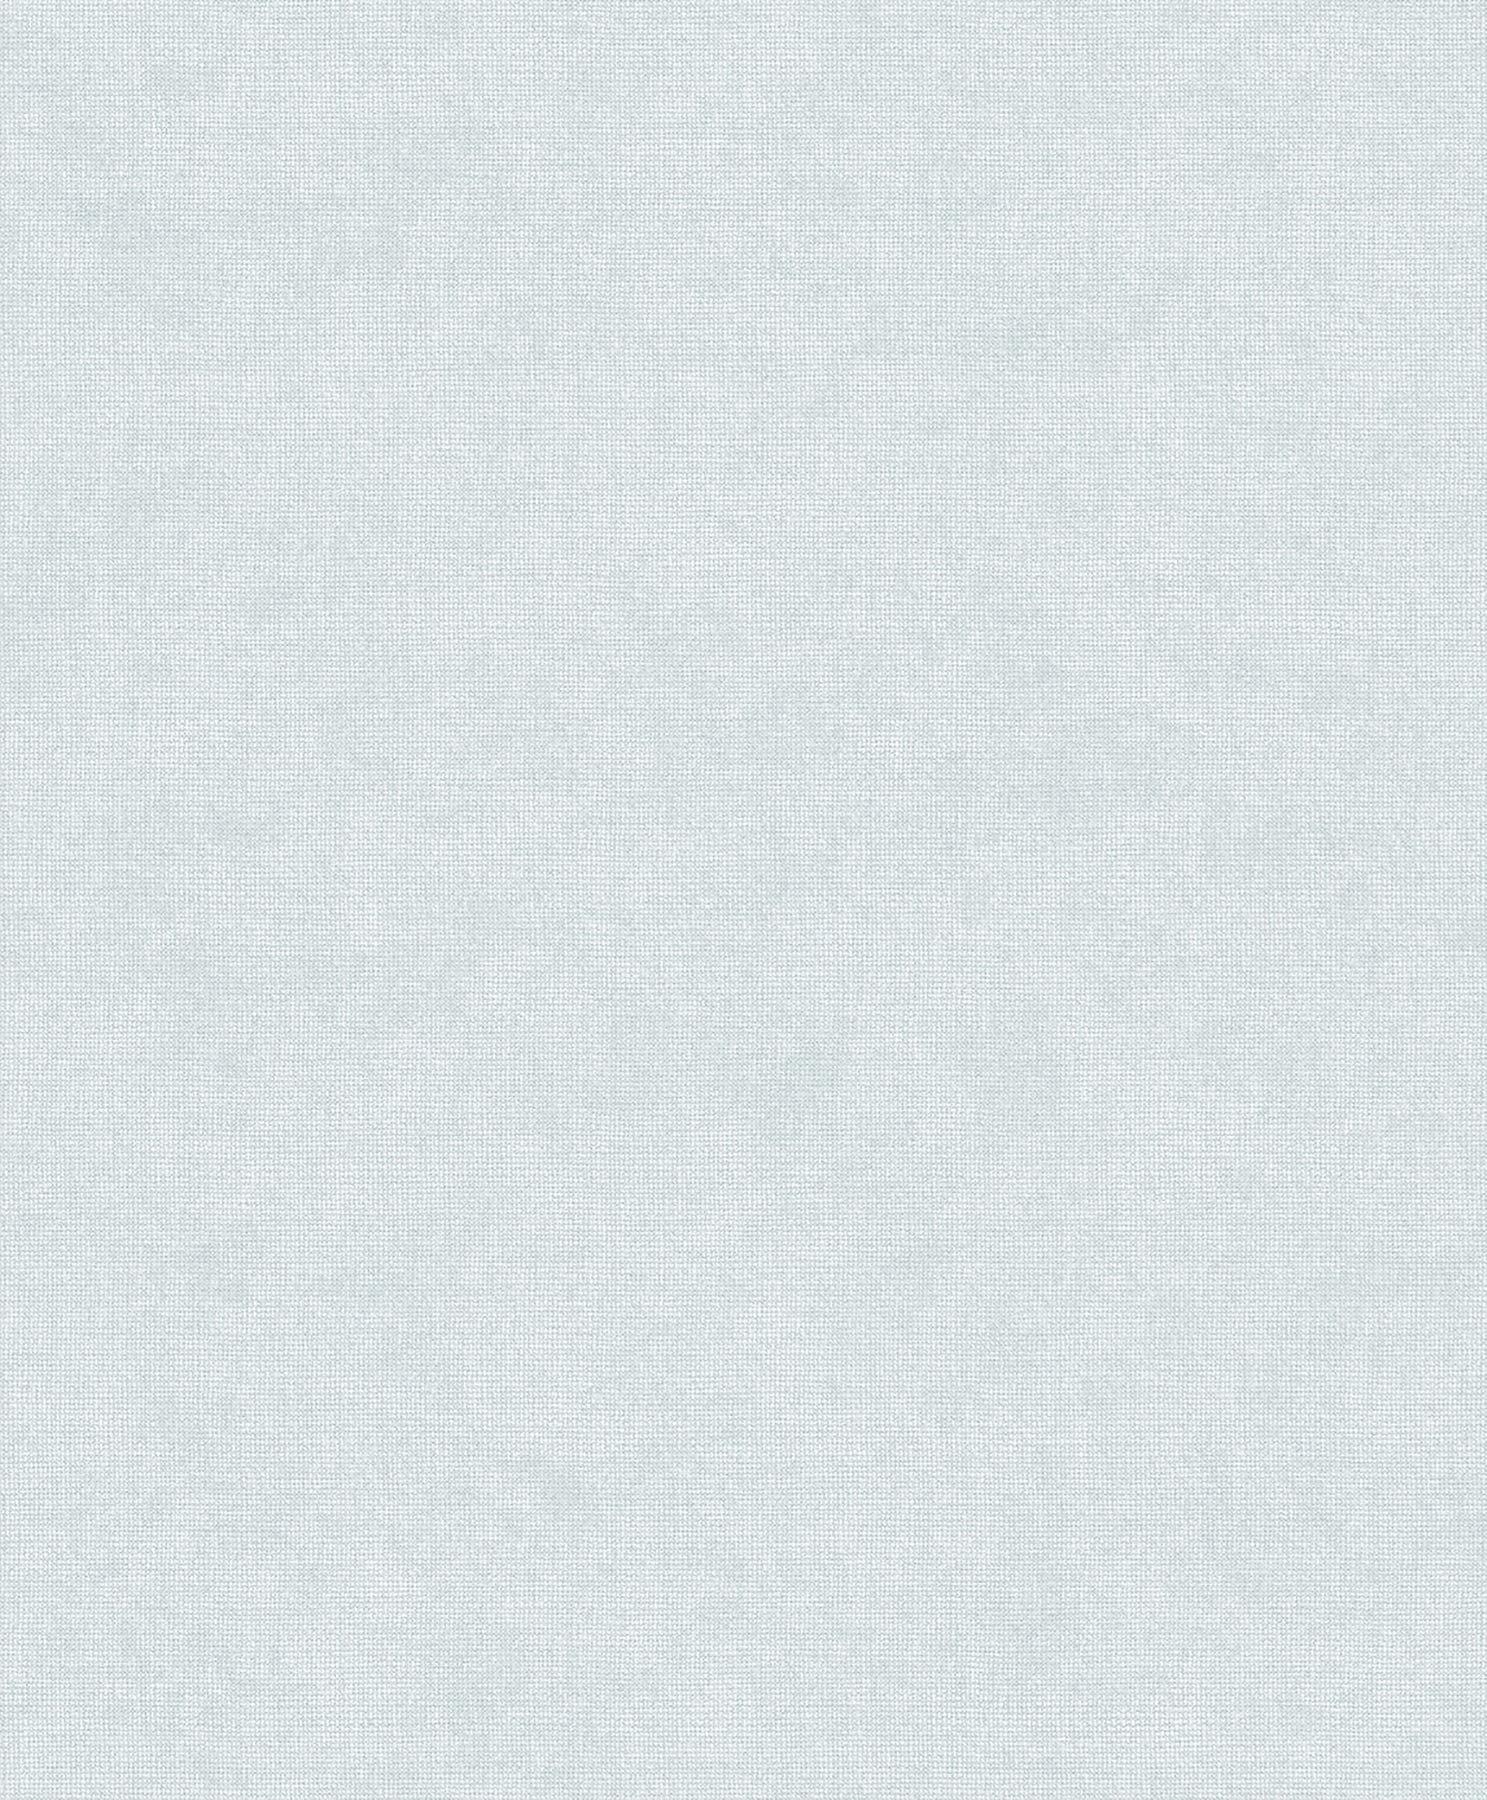 Advantage 2809-SH01238 Nina Light Blue Texture Wallpaper